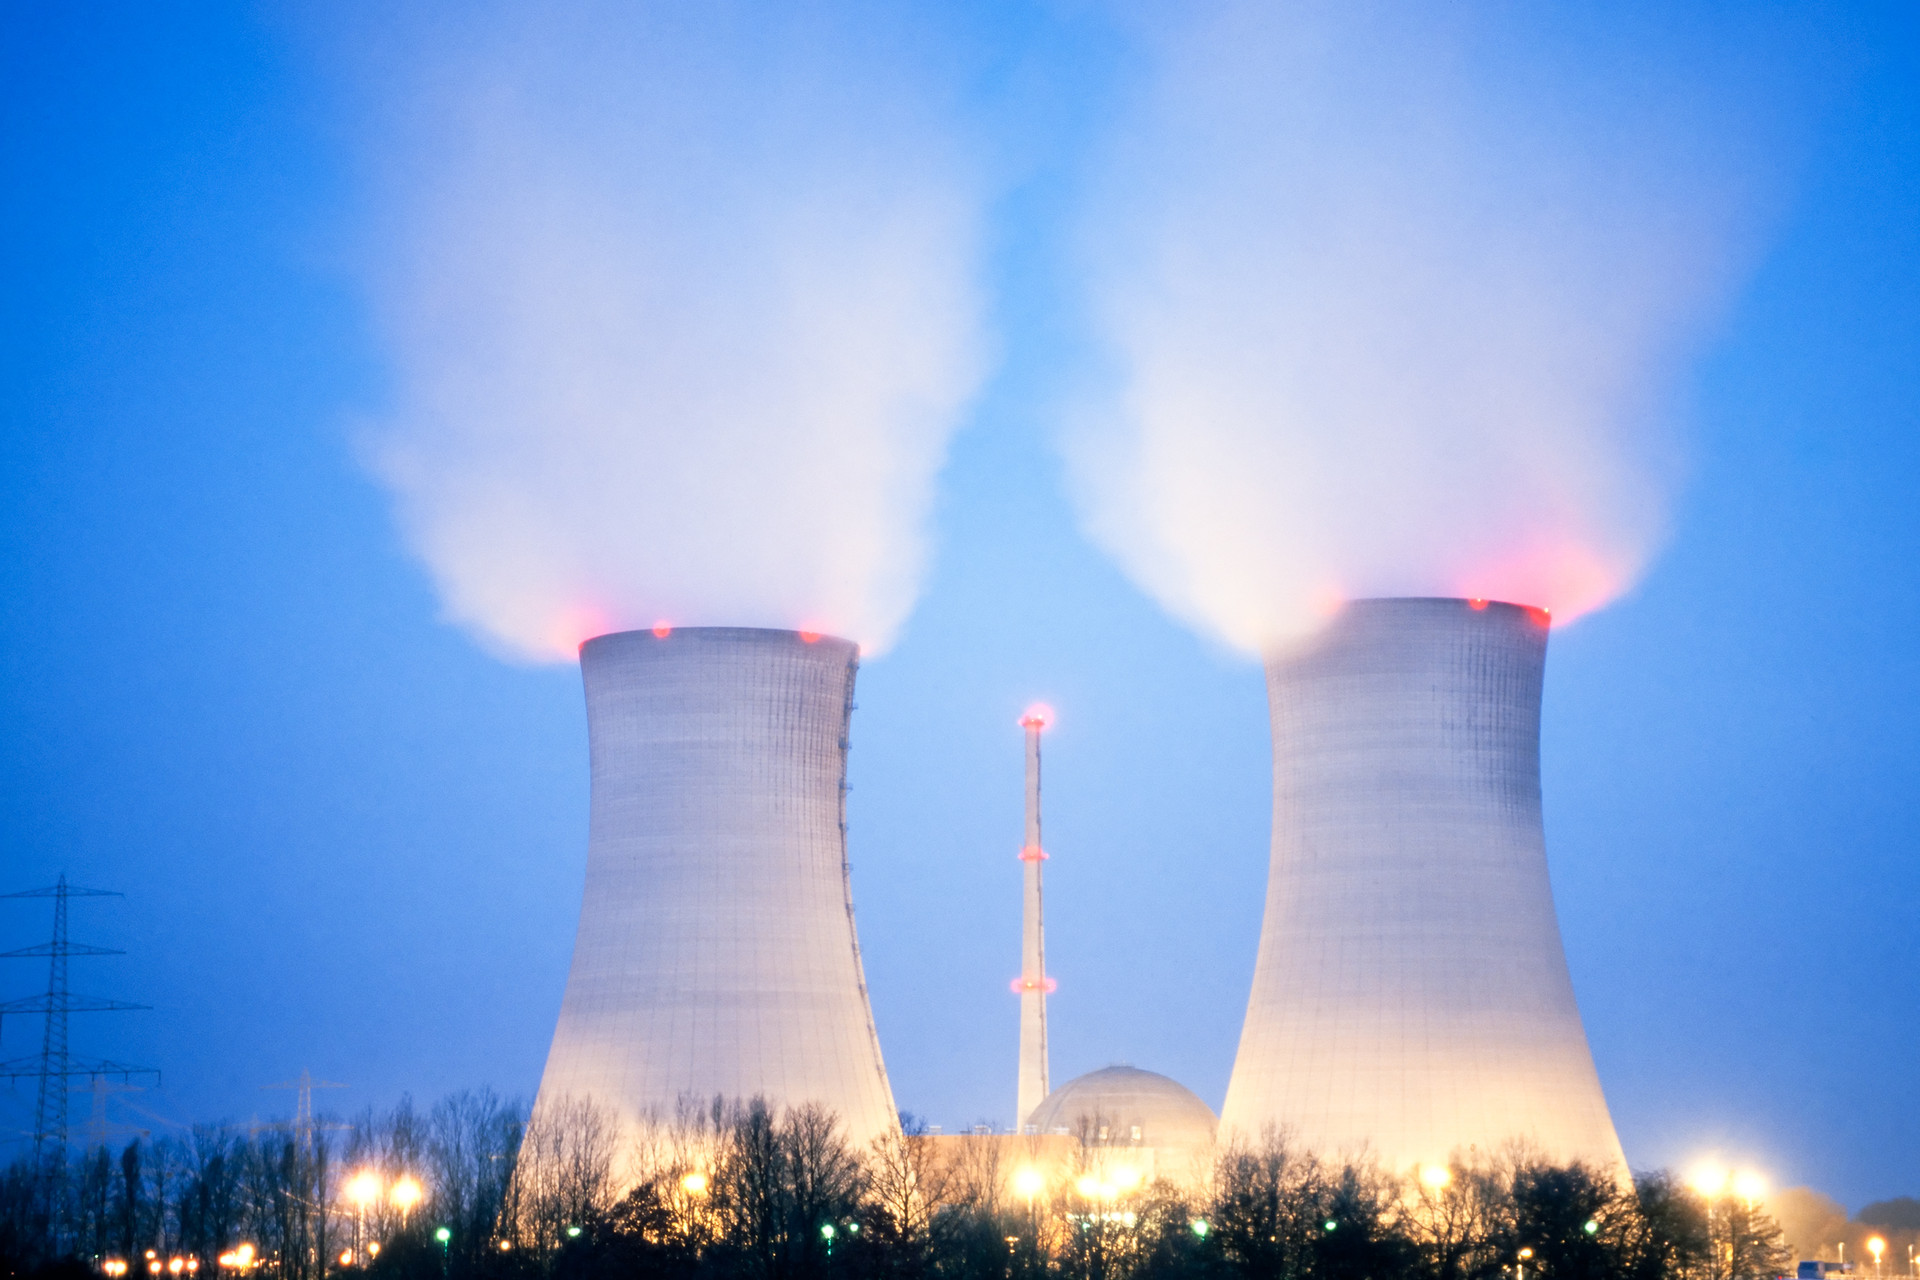 nuclear-power-plant-past-sundown-U4LTD2E